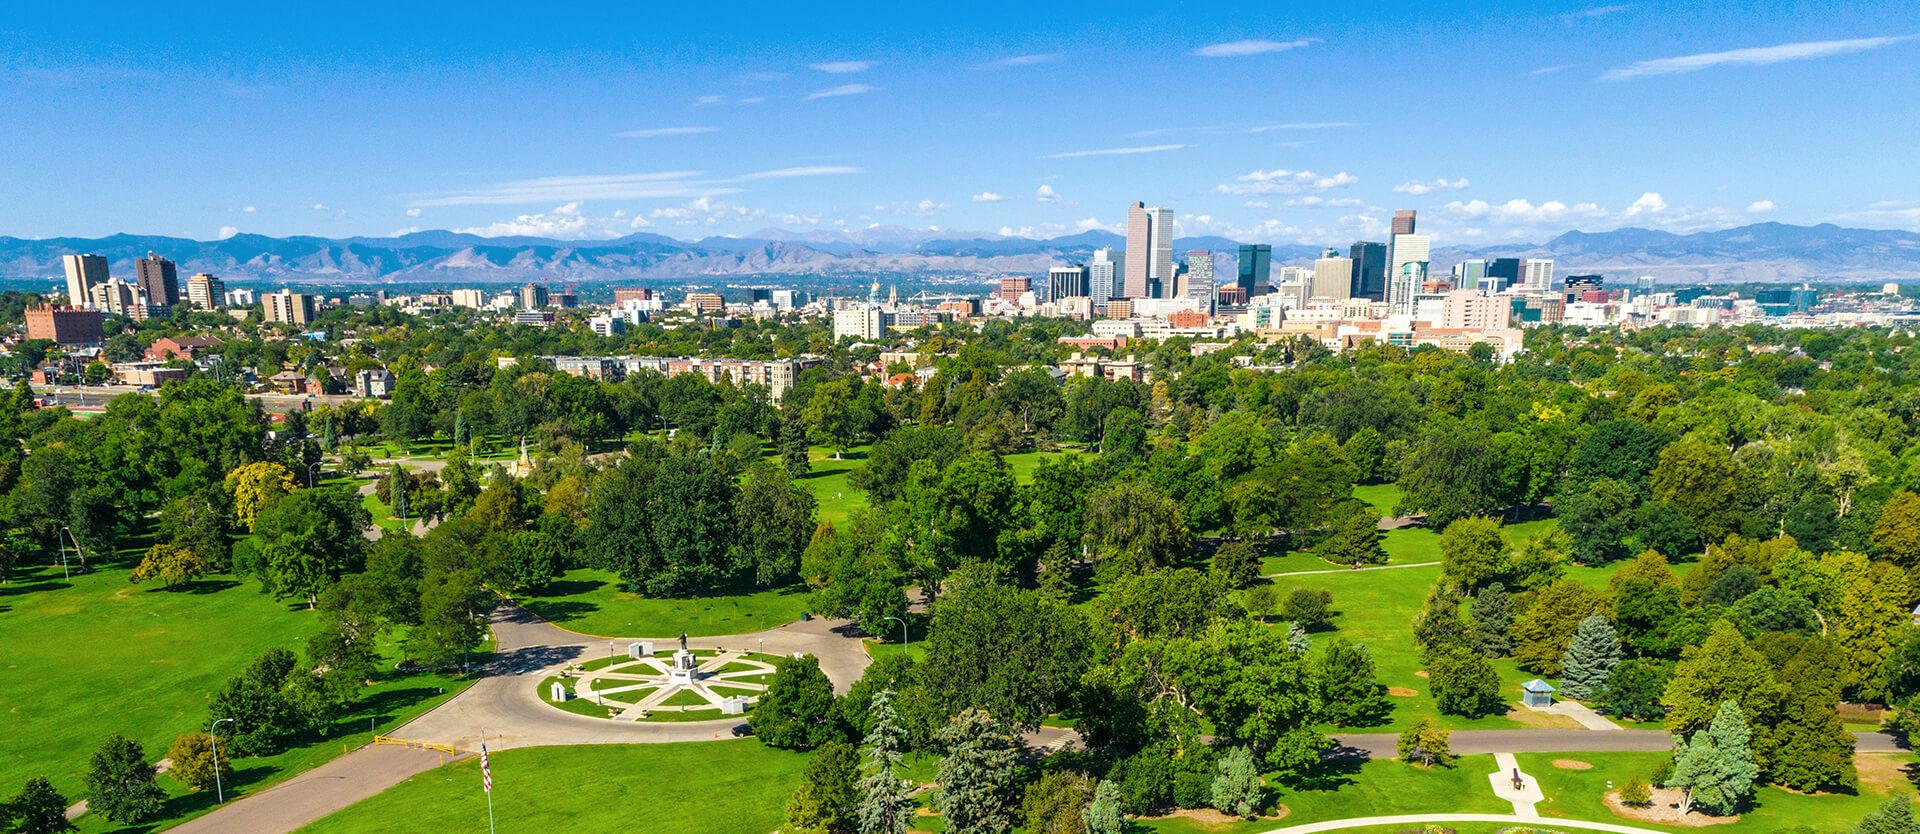 MEDSource - BioSkills Rental Equipment - Denver Skyline - Slider 1